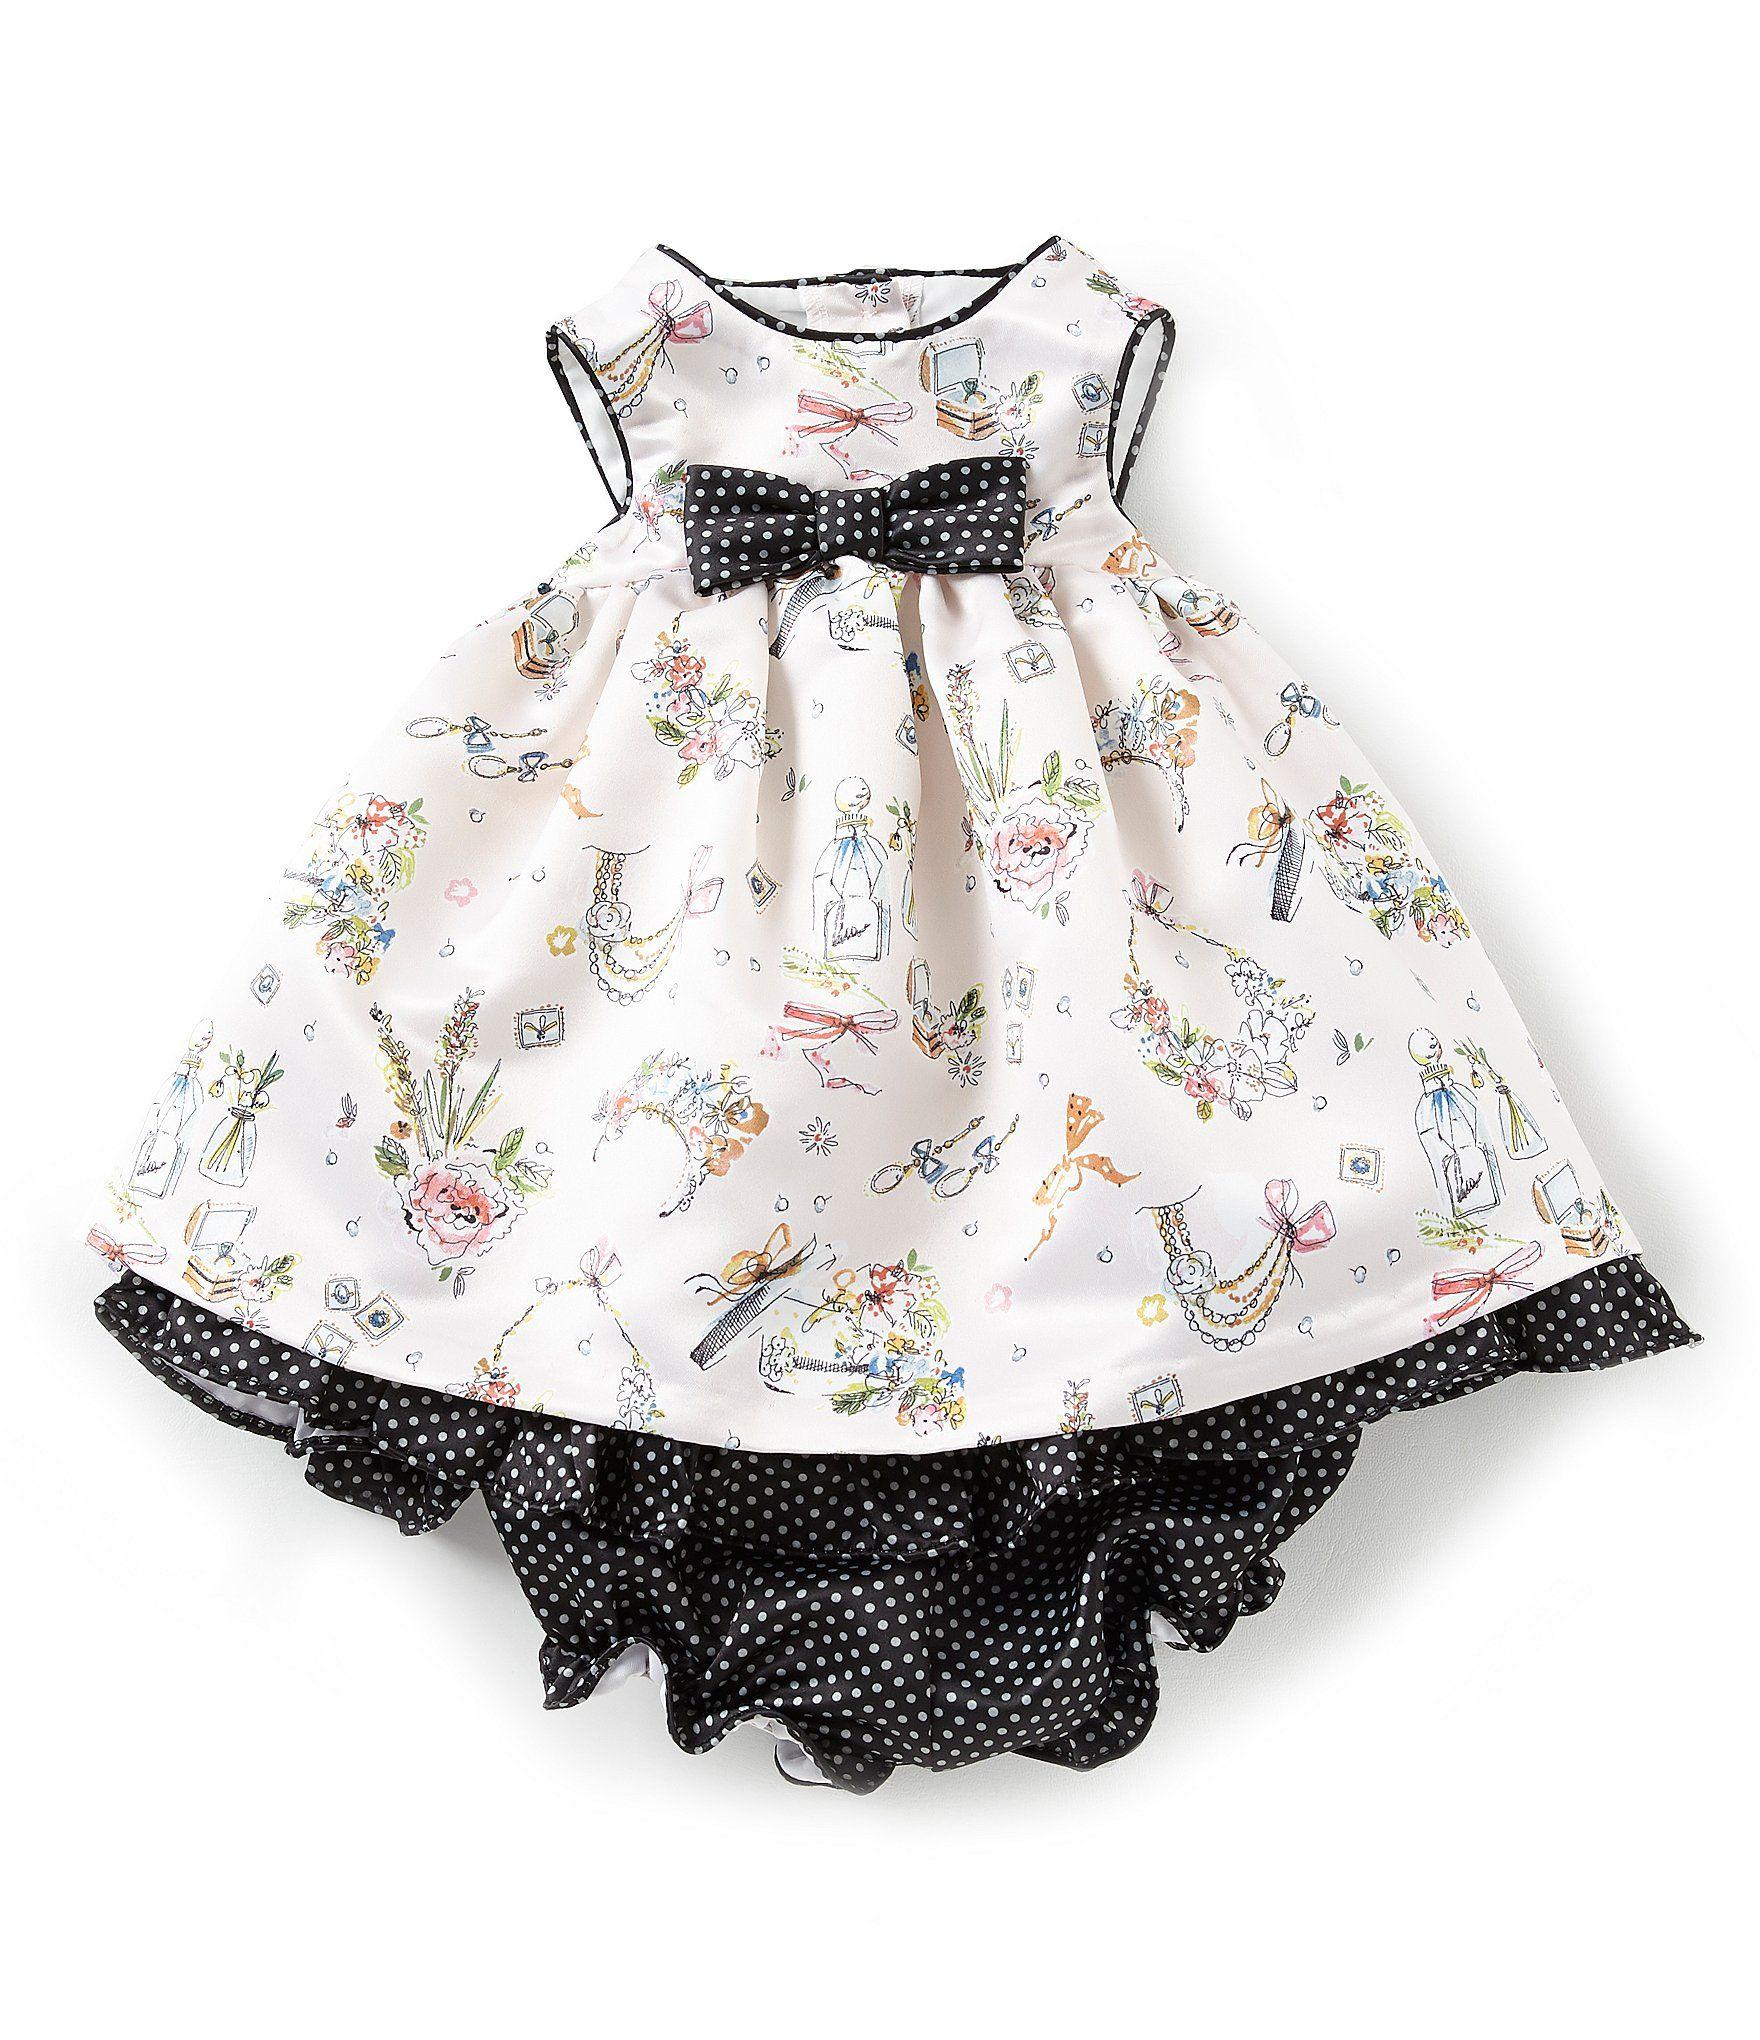 38aee081c Laura Ashley London Baby Girls Newborn24 Months SketchPrinted FitAndFlare  Dress #Dillards